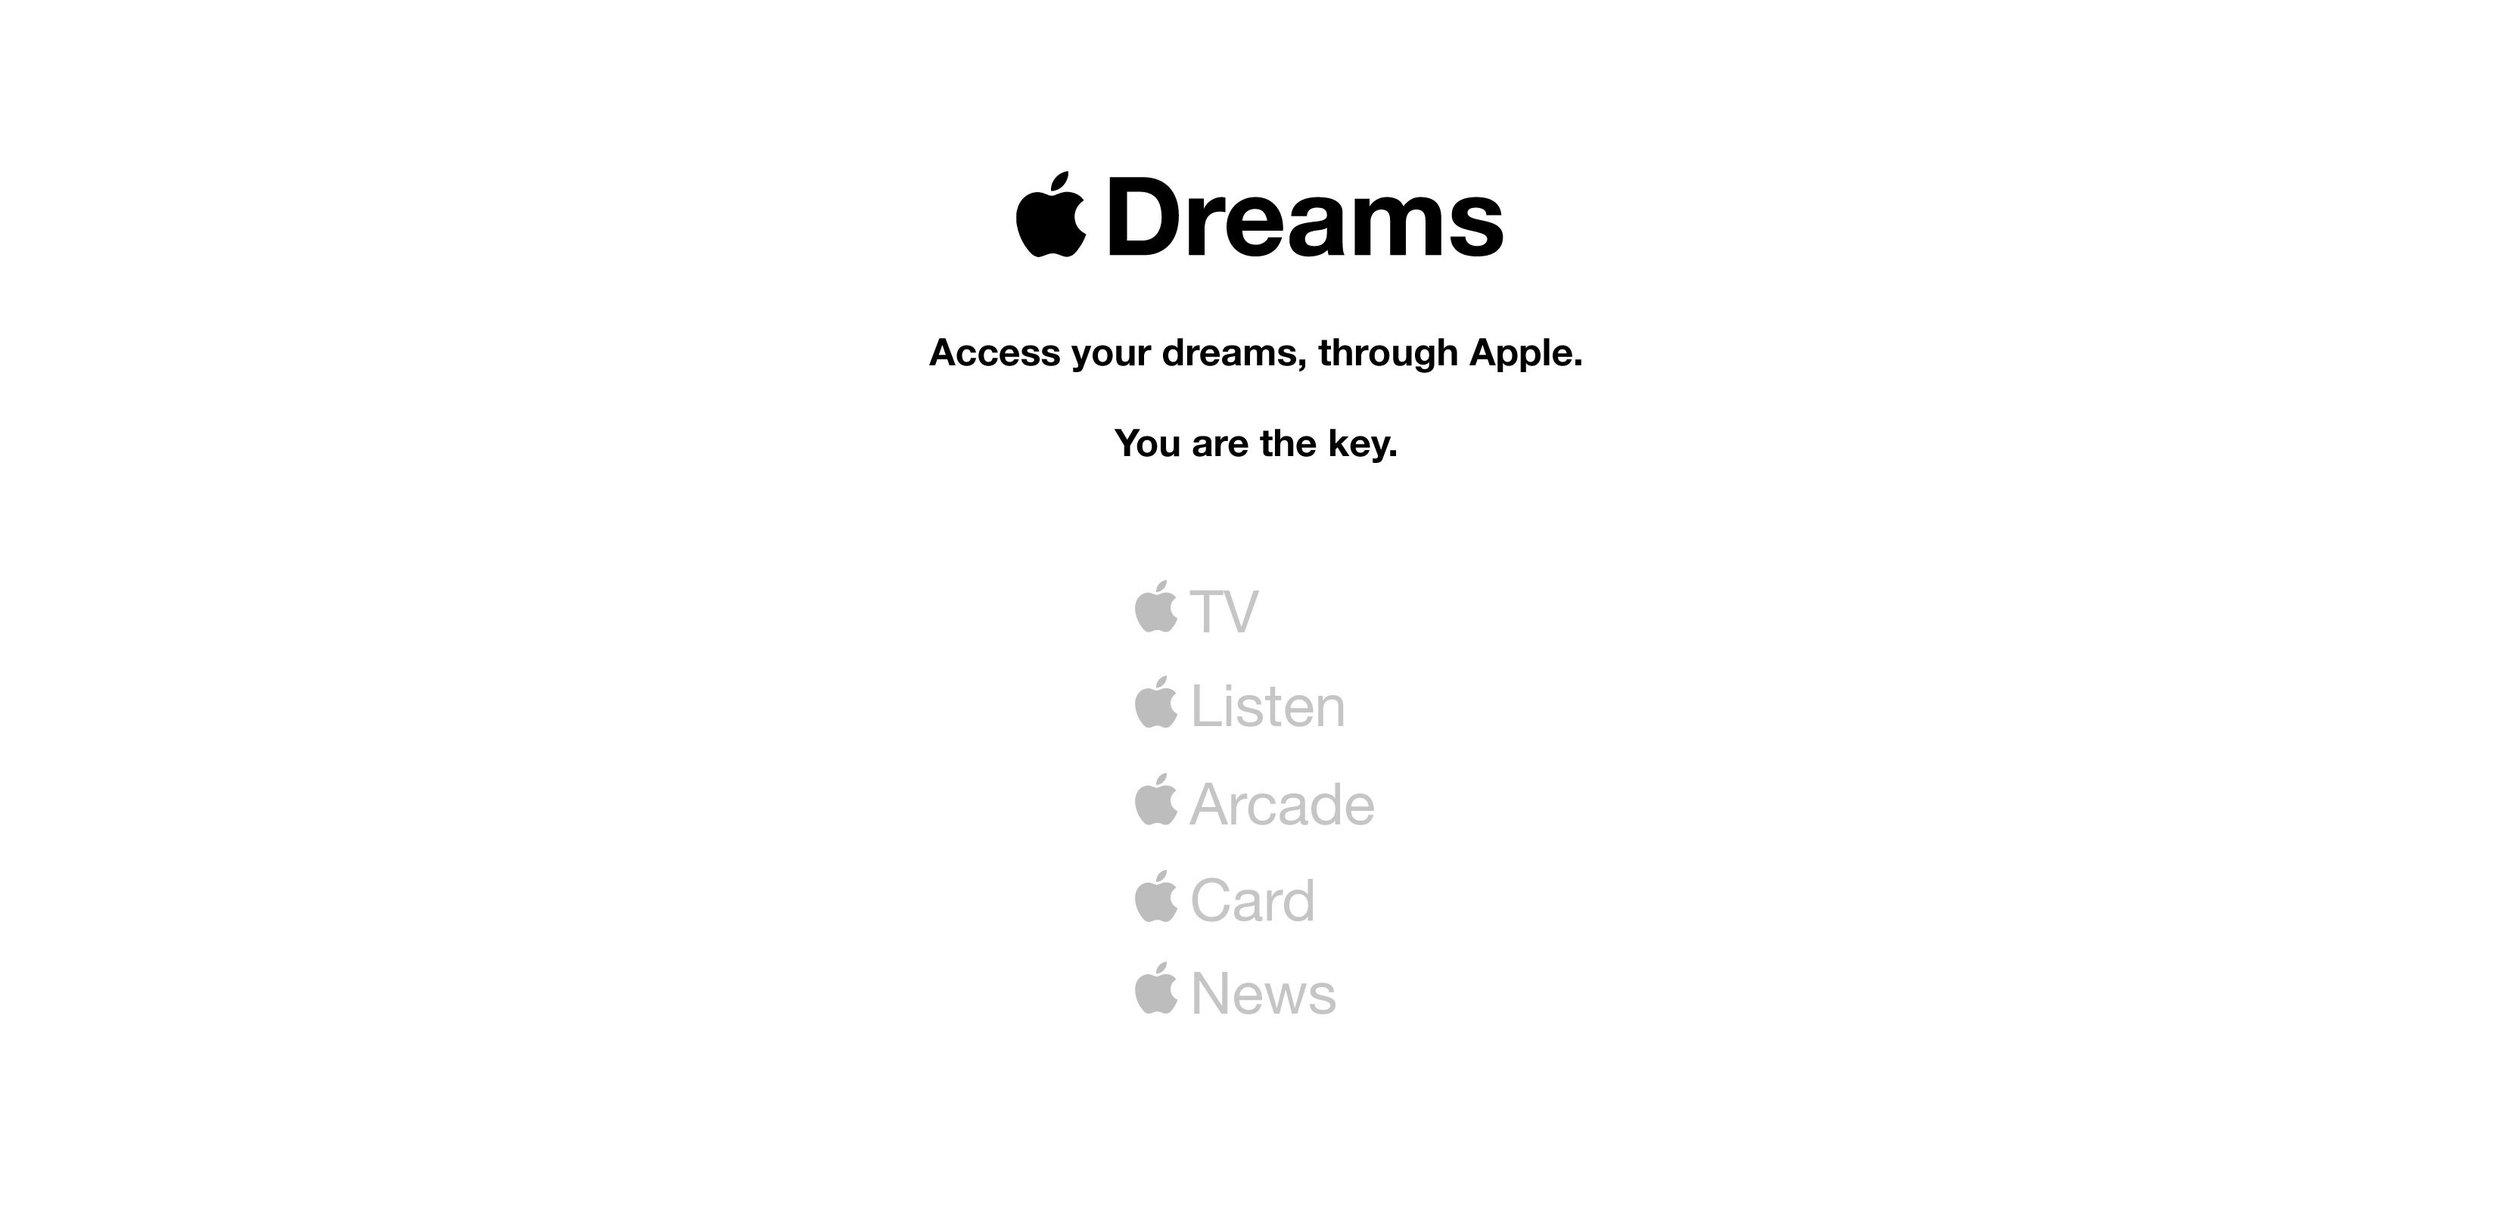 Apple Dreams Campaign- Melanie Blanchard Gong v2-04 copy.jpg